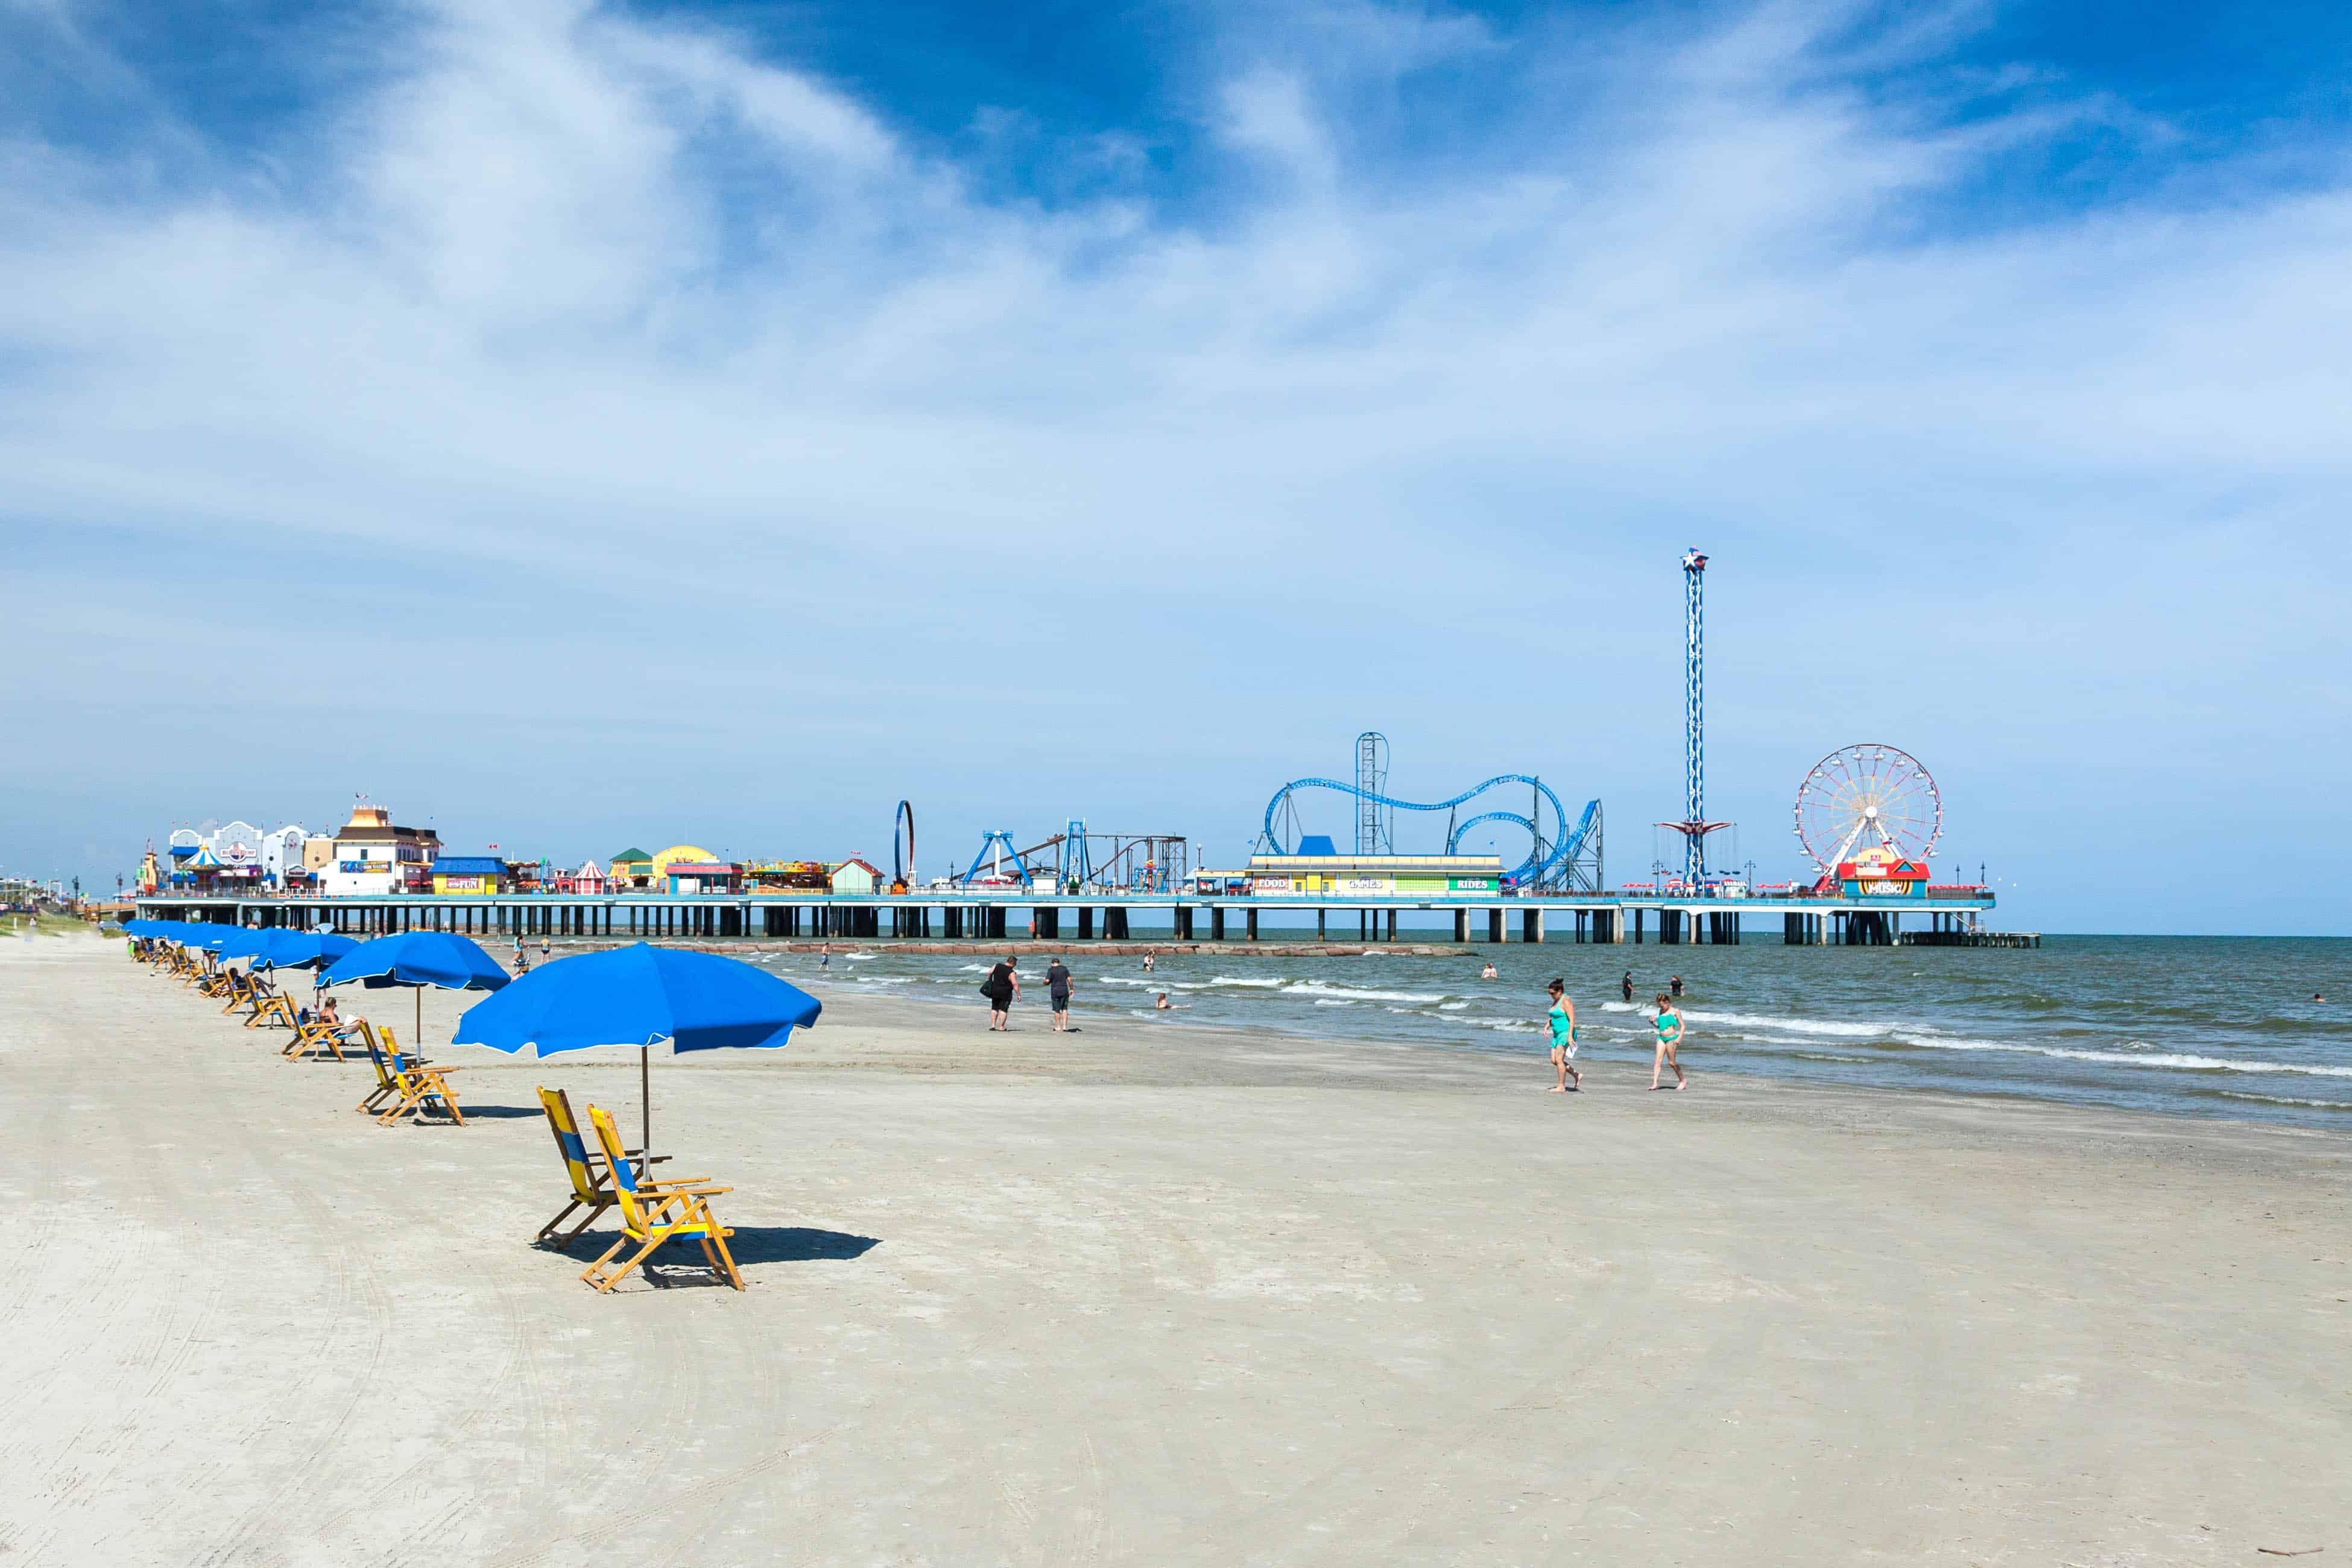 A view of the beach in Galveston TX